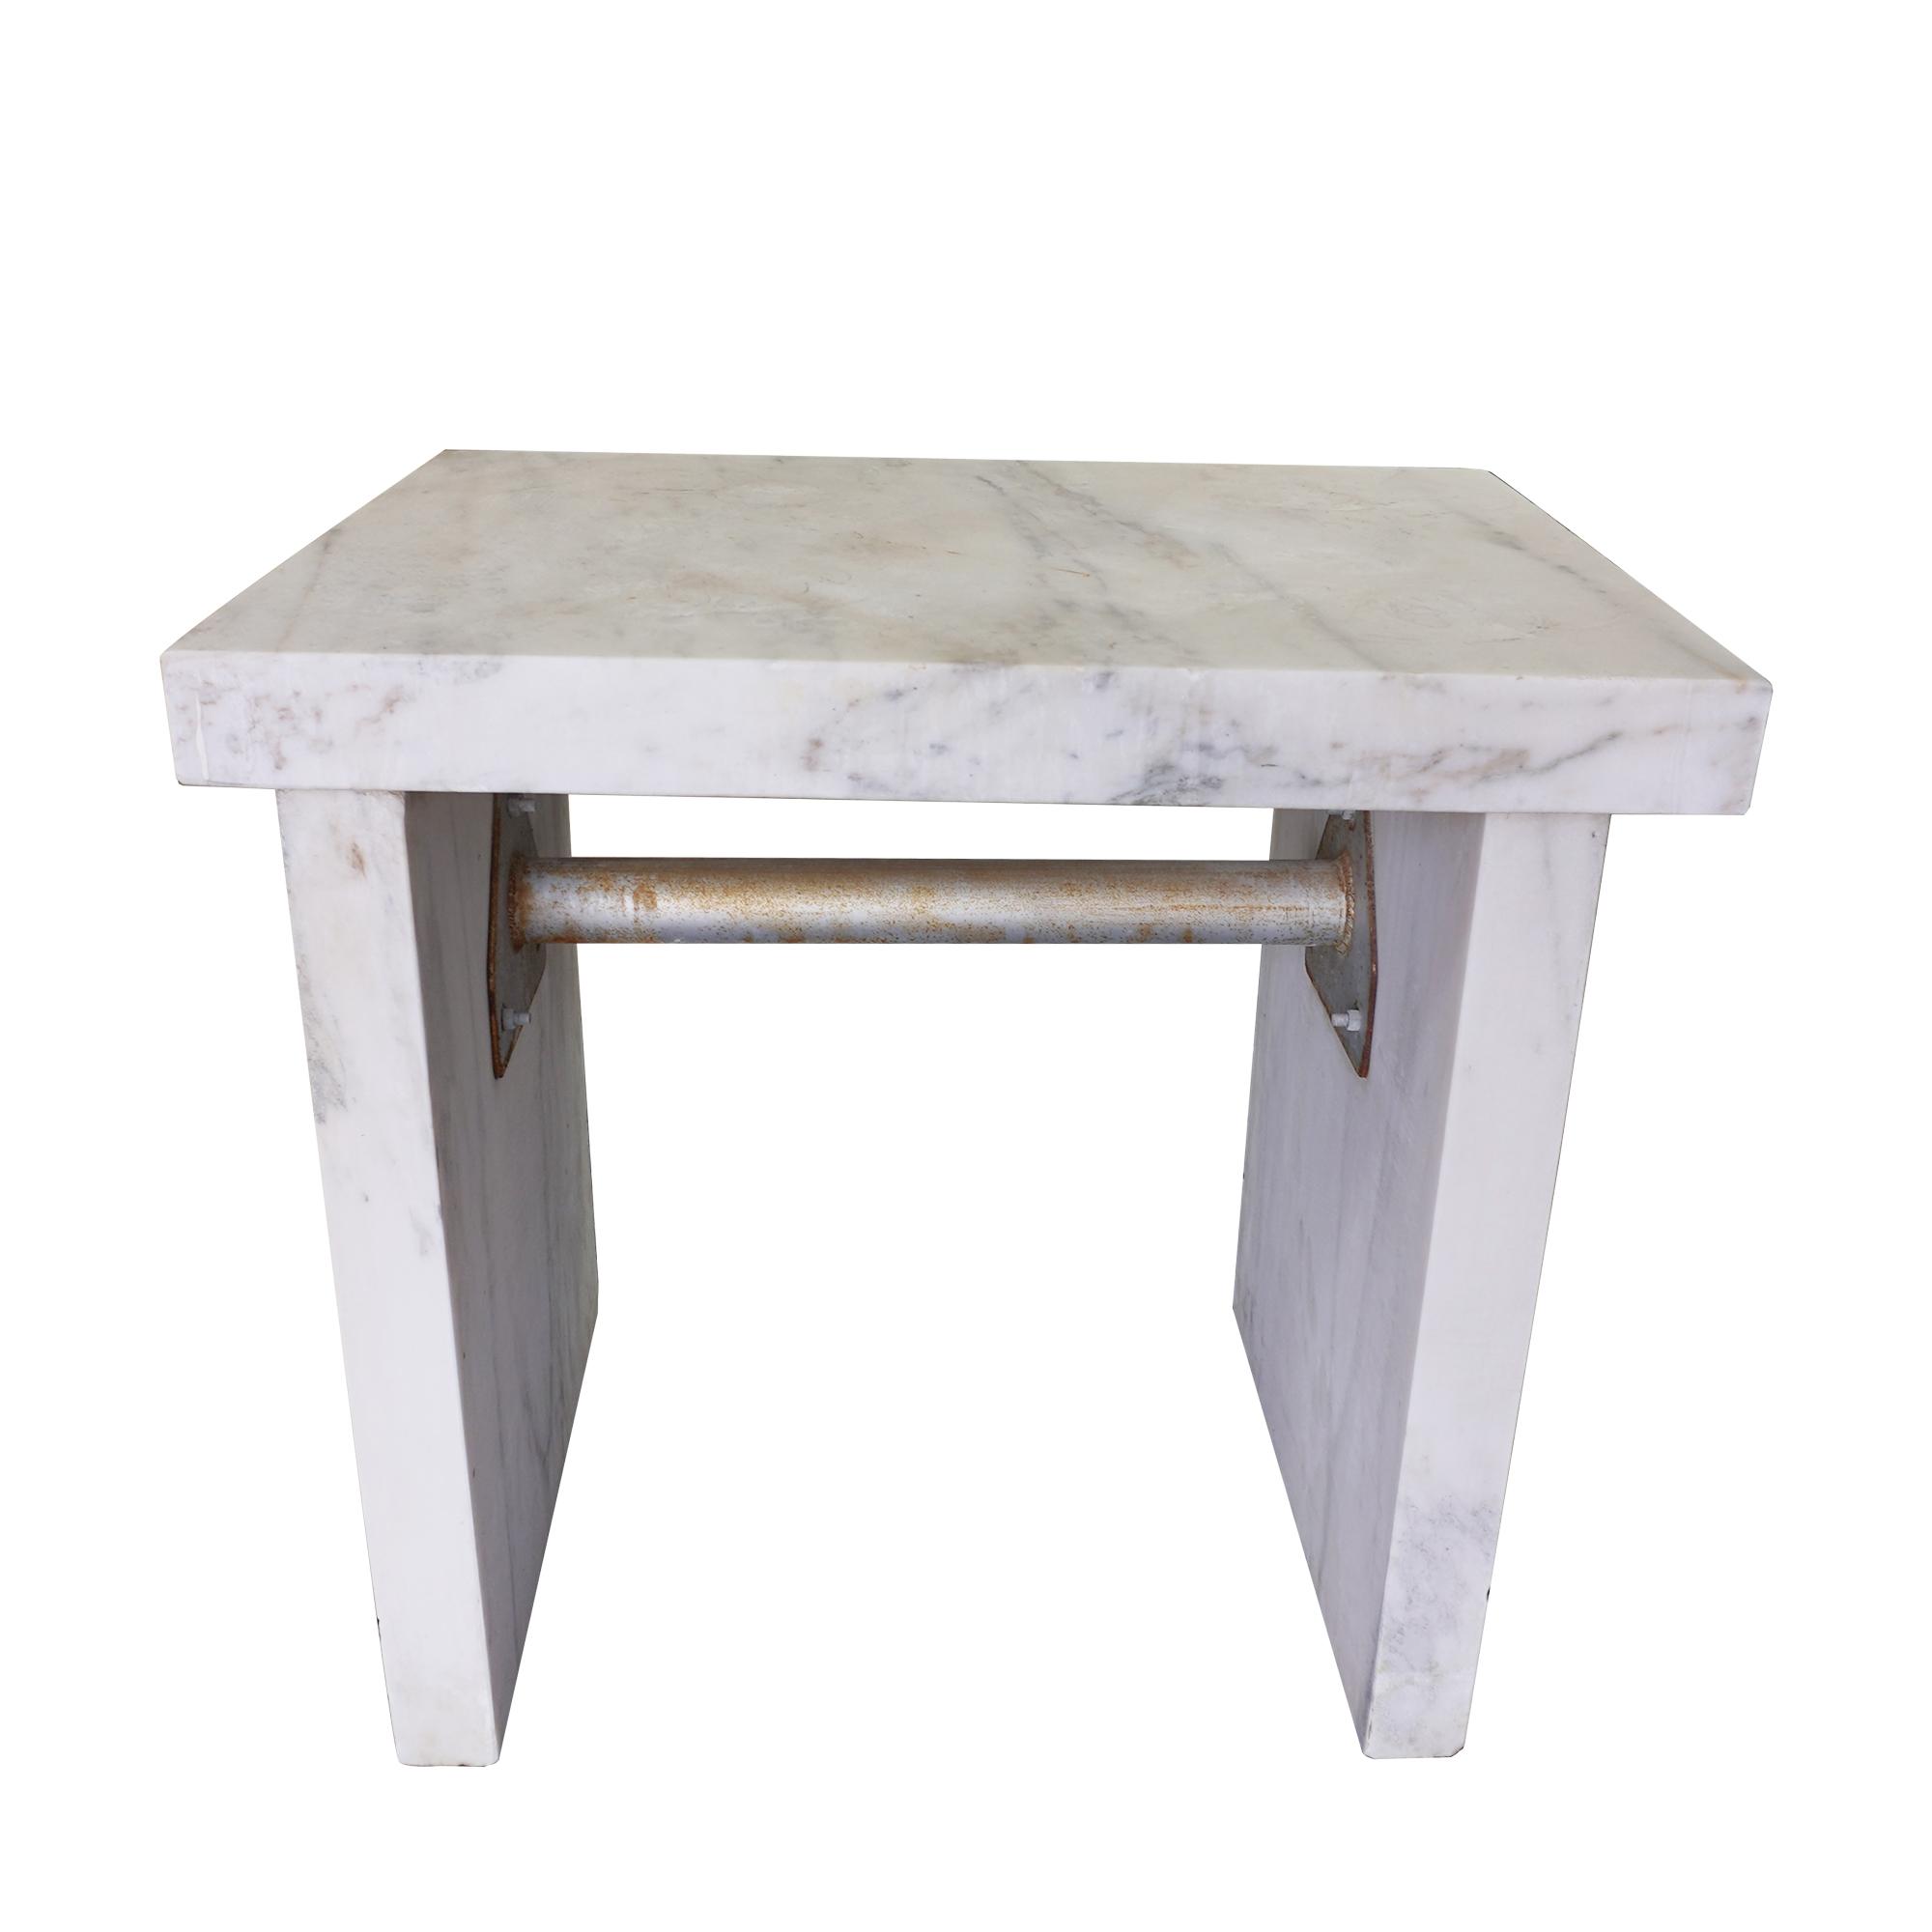 big-table-1.jpg